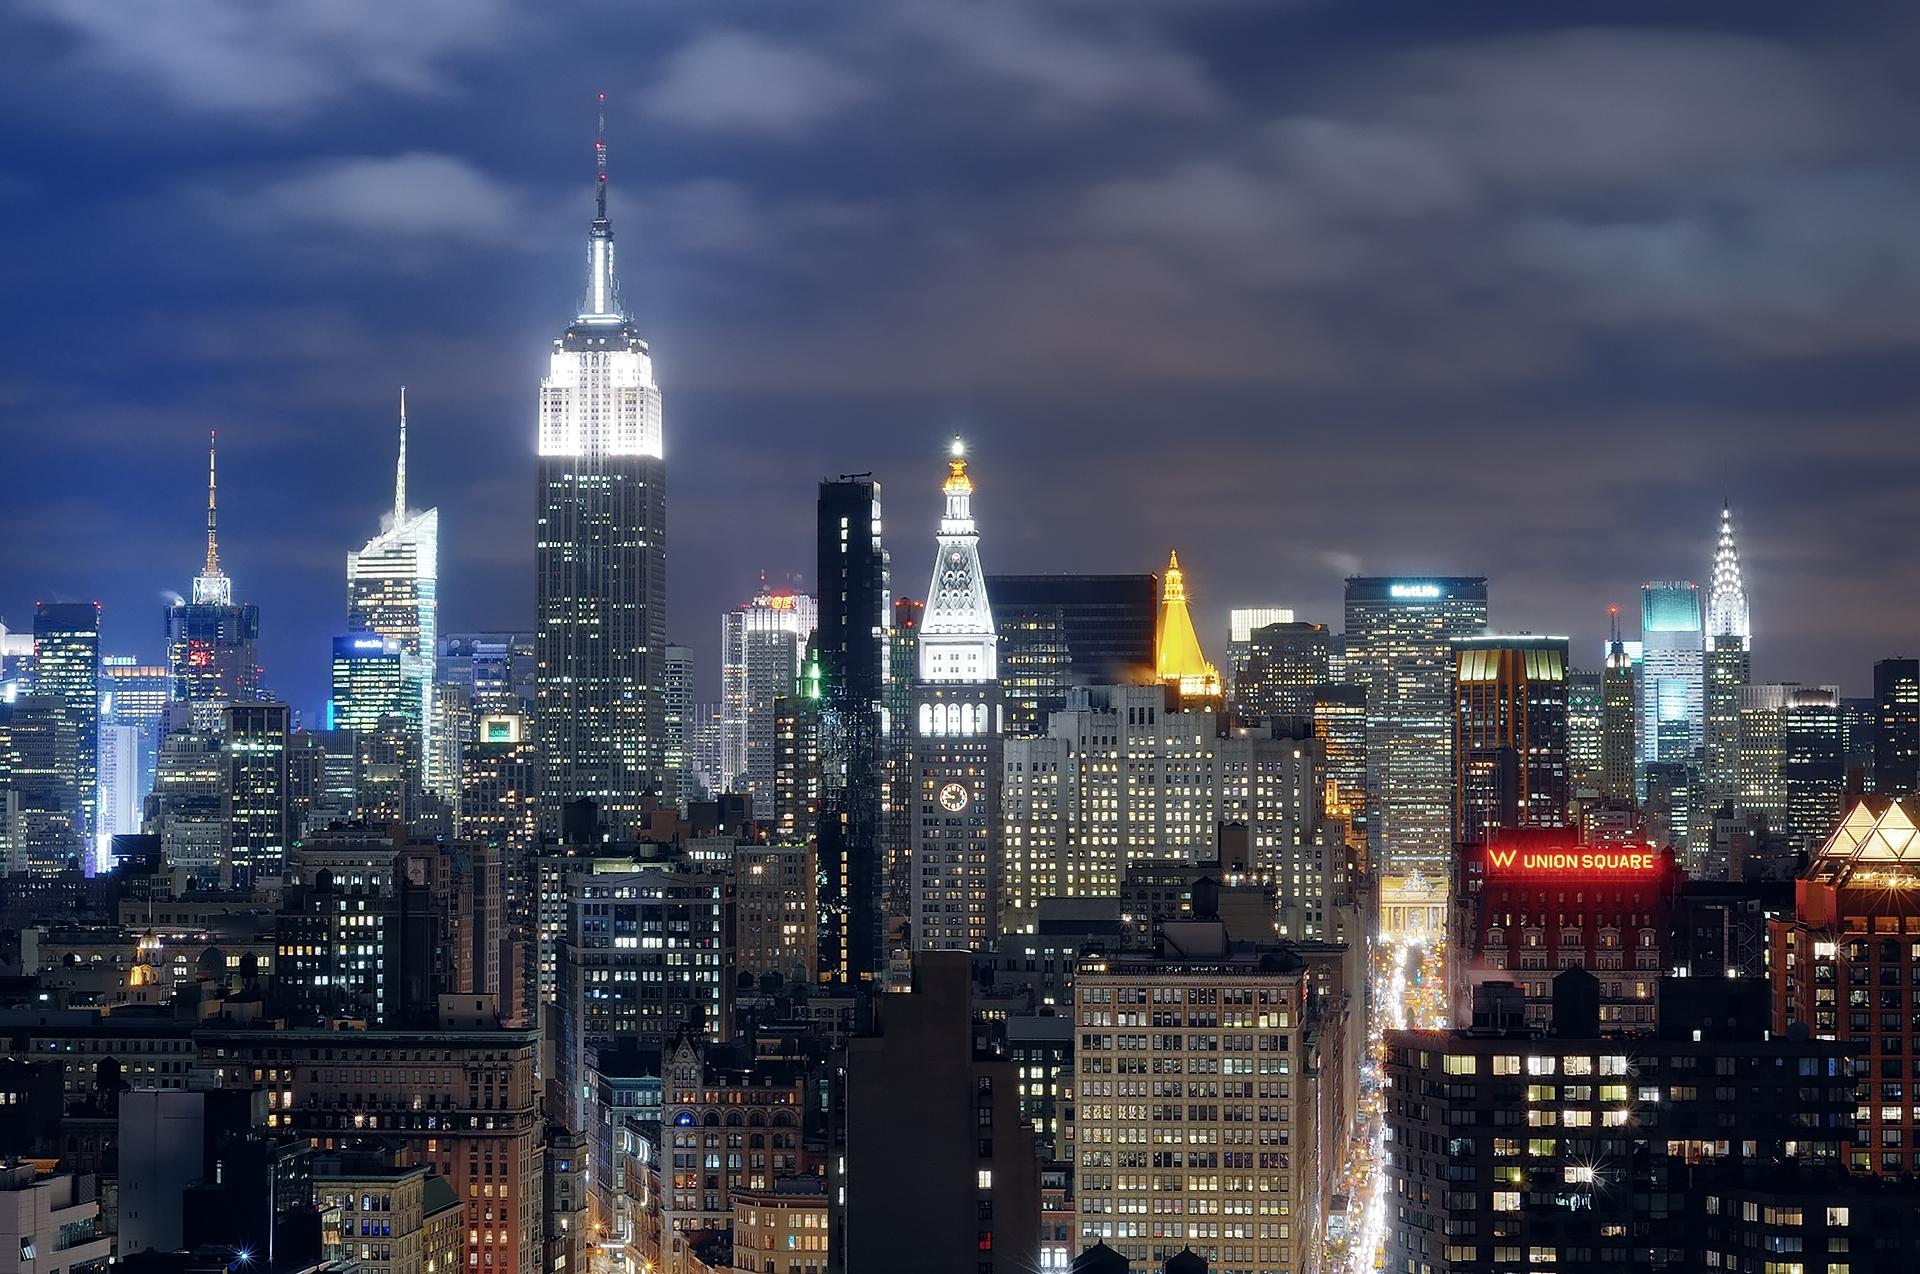 new york manhattan - photo #20